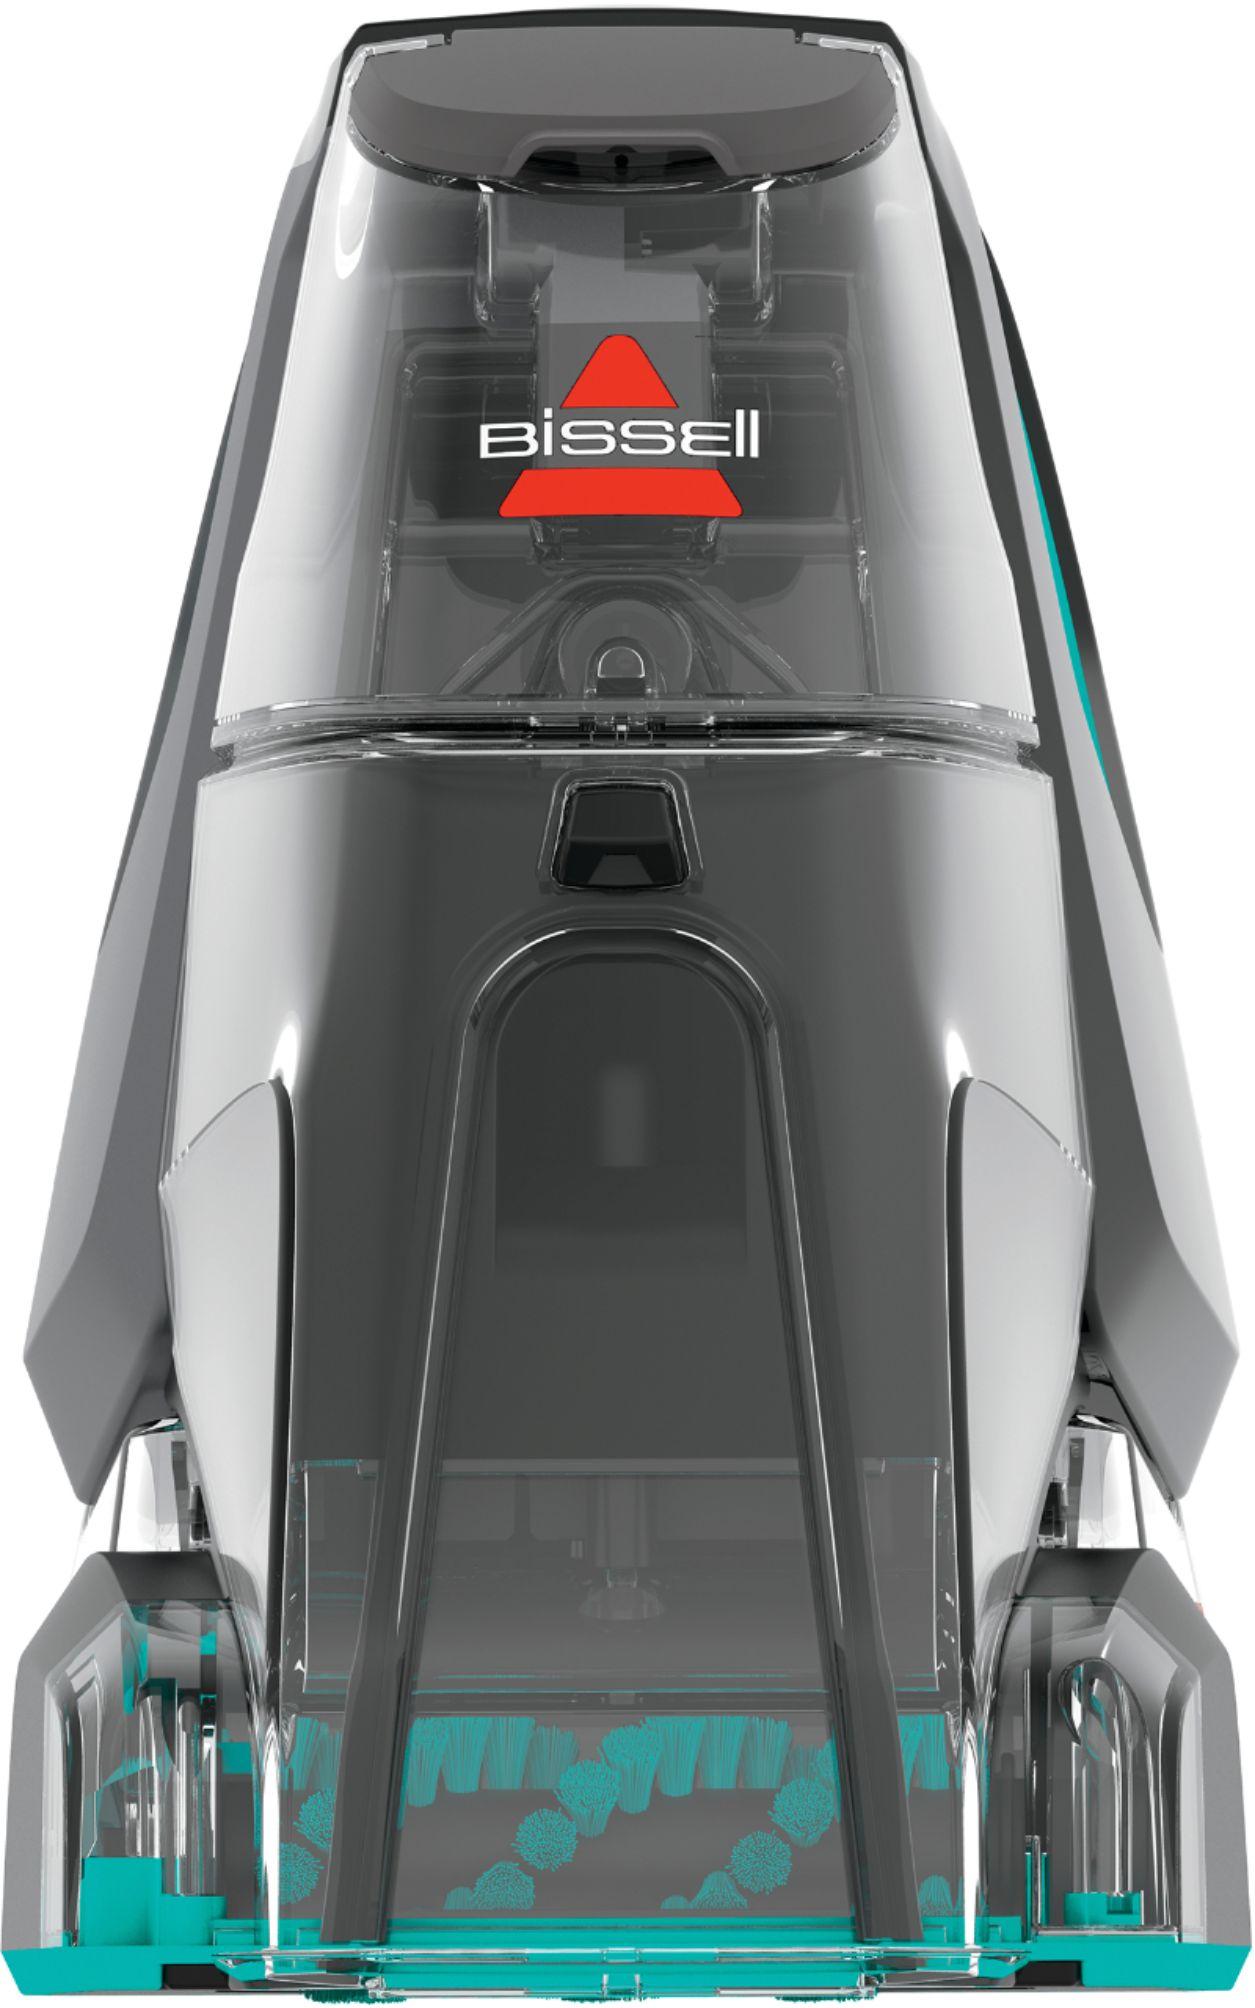 Bissell Pet Stain Eraser Vs Little Green : bissell, stain, eraser, little, green, Customer, Reviews:, BISSELL, Stain, Eraser™, PowerBrush, Cordless, Portable, Carpet, Cleaner, Titanium, Electric